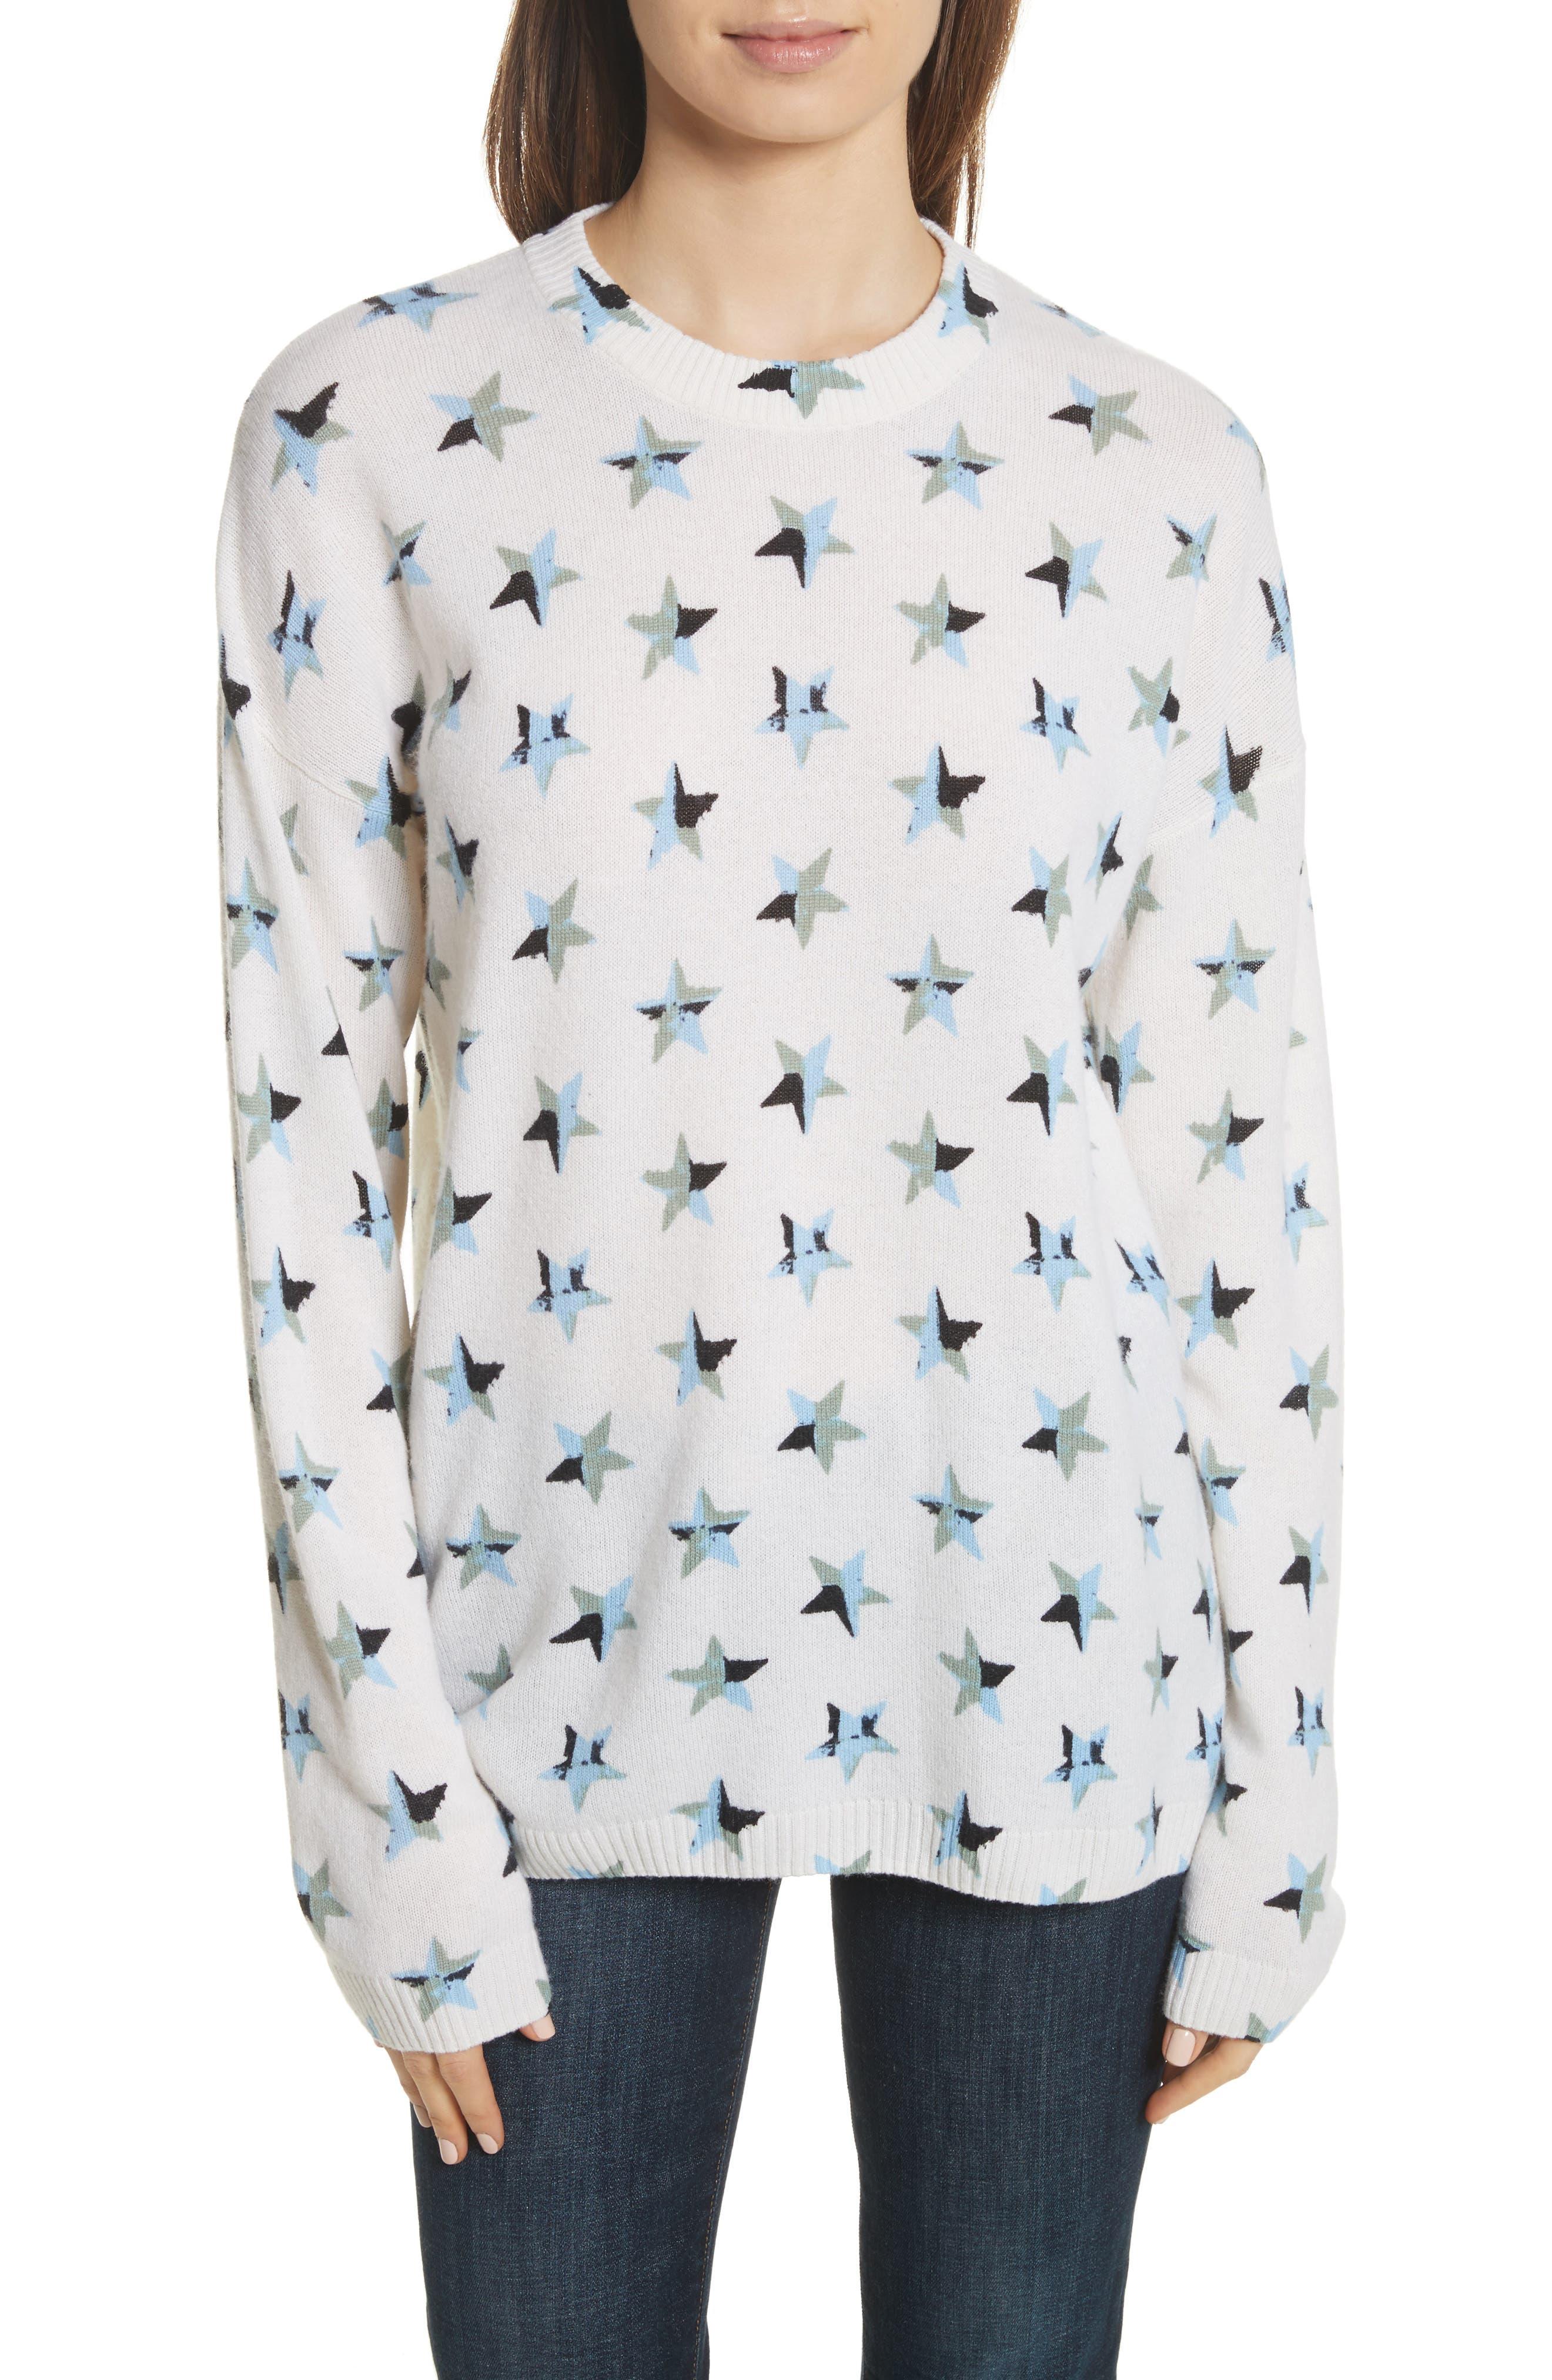 Main Image - Equipment Bryce Star Print Cashmere Sweater